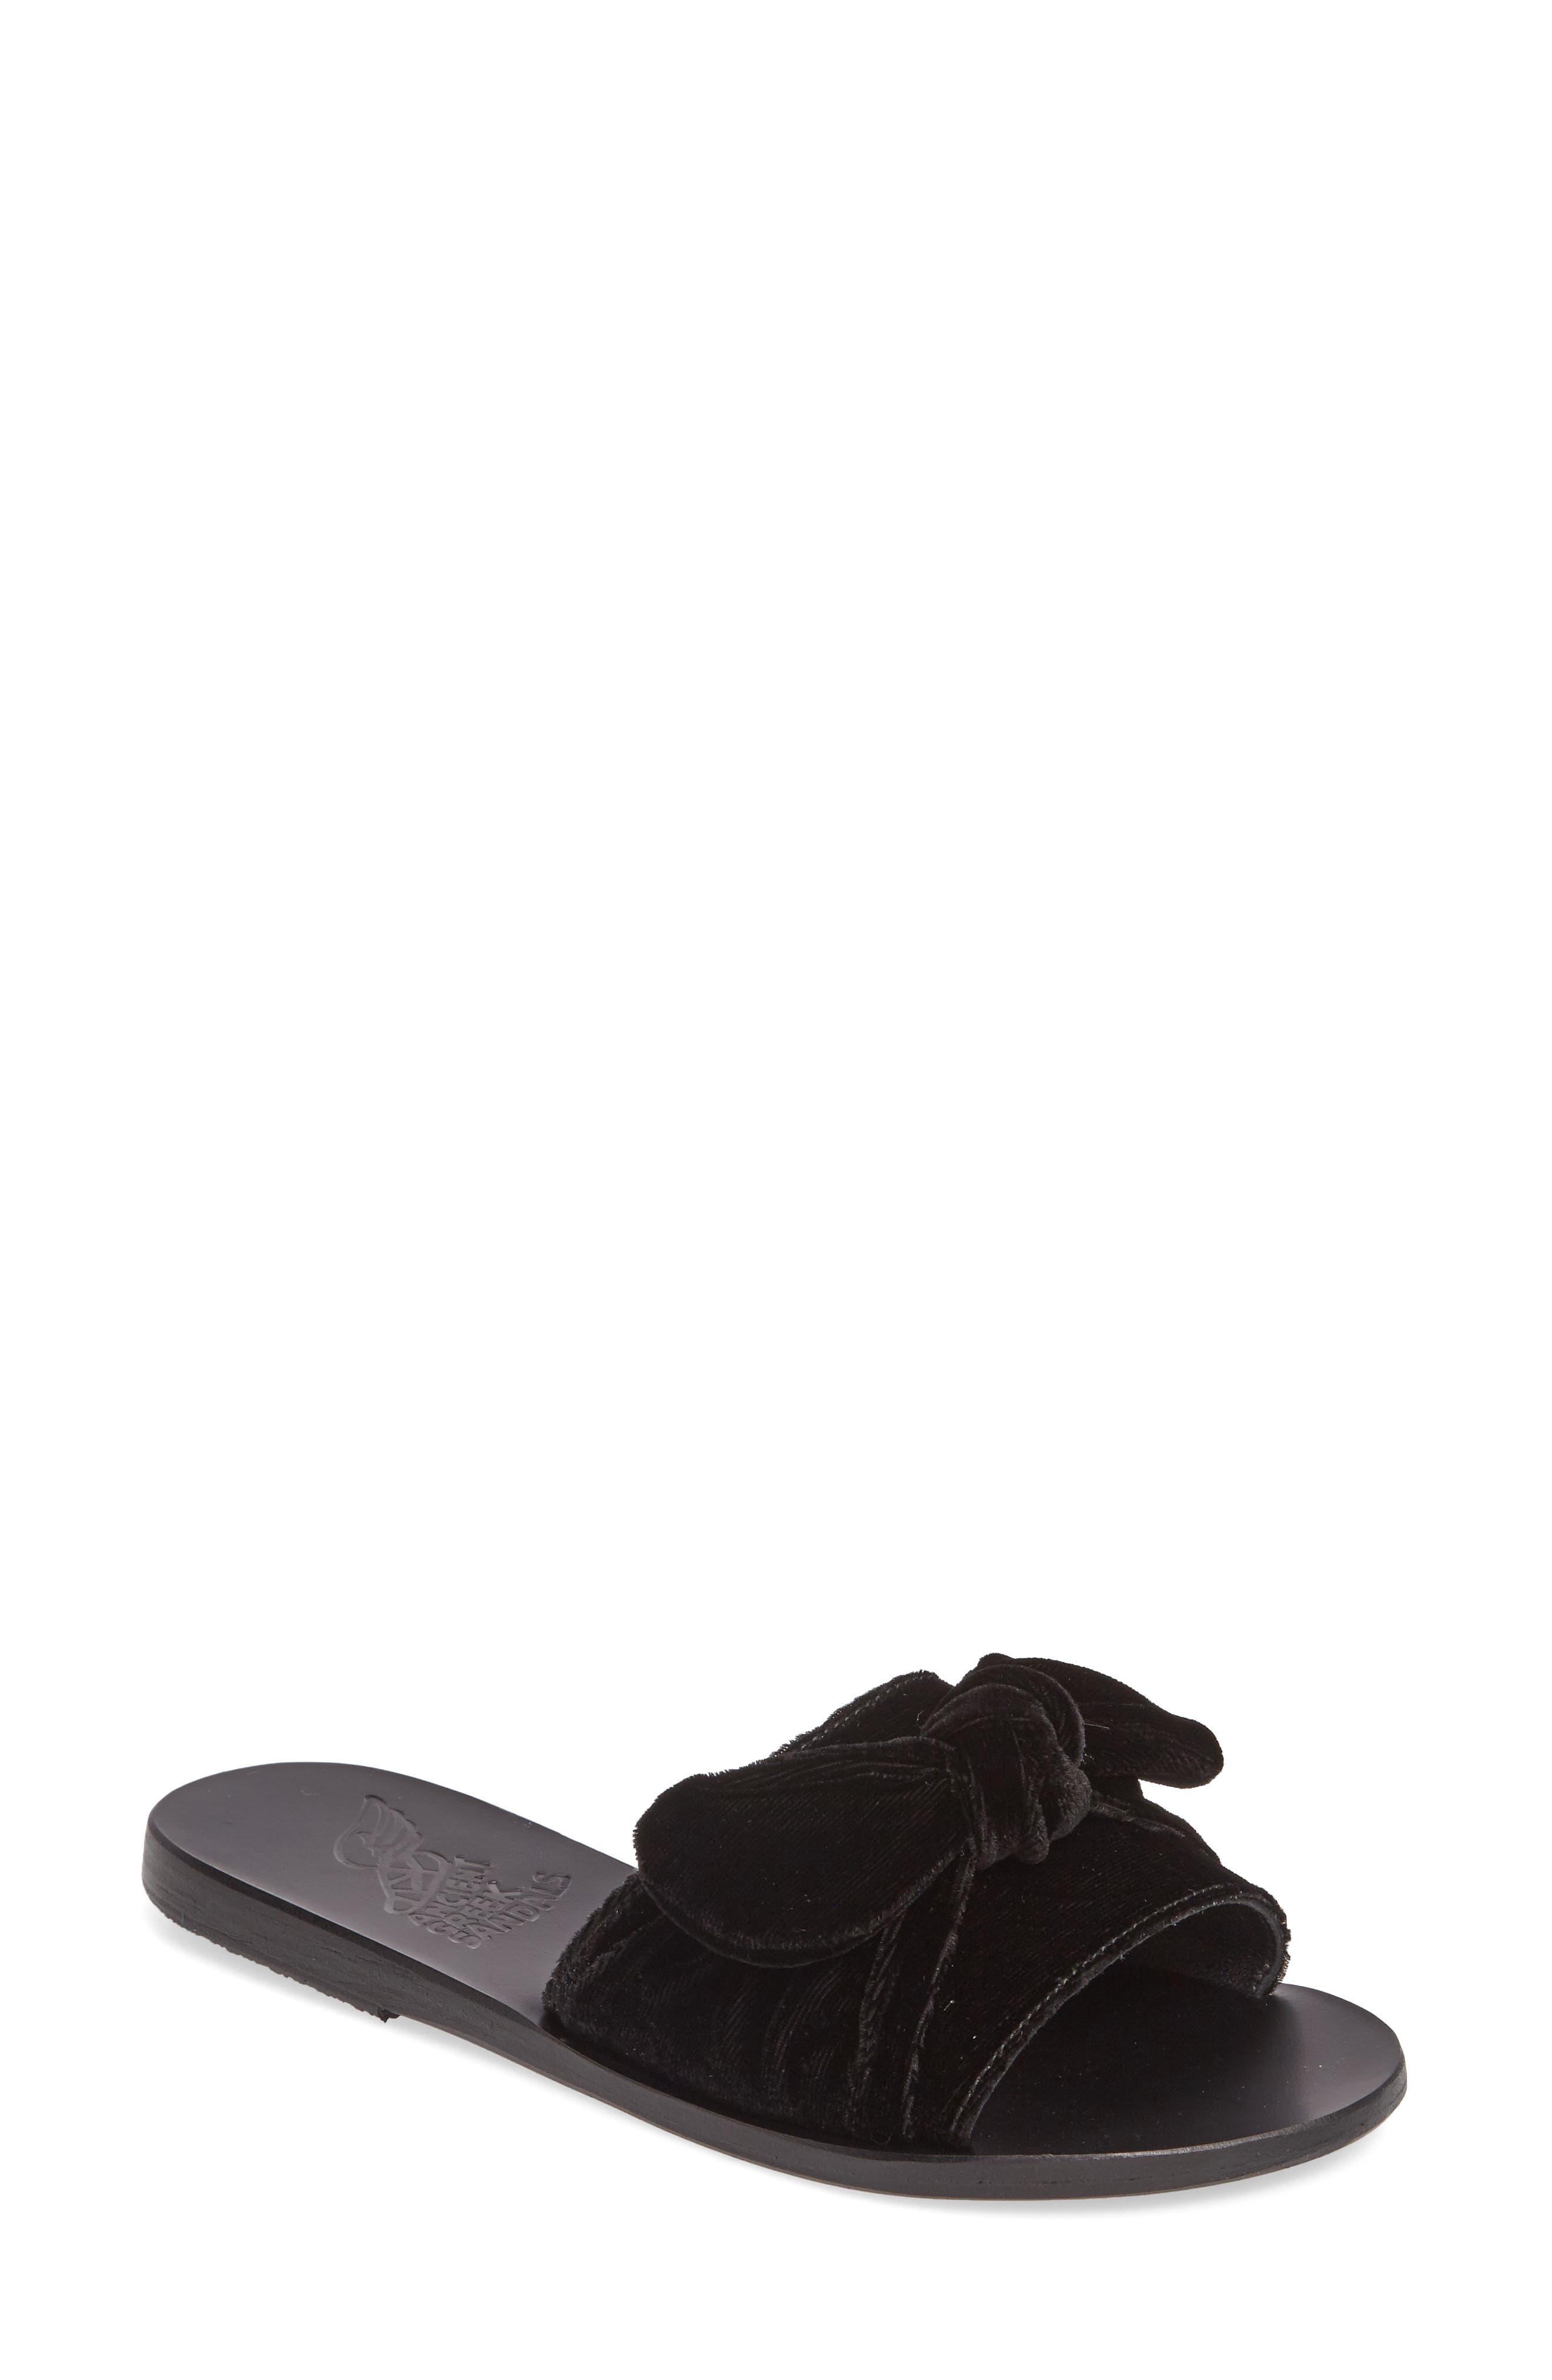 Alternate Image 1 Selected - Ancient Greek Sandals Taygete Bow Slide Sandal (Women)